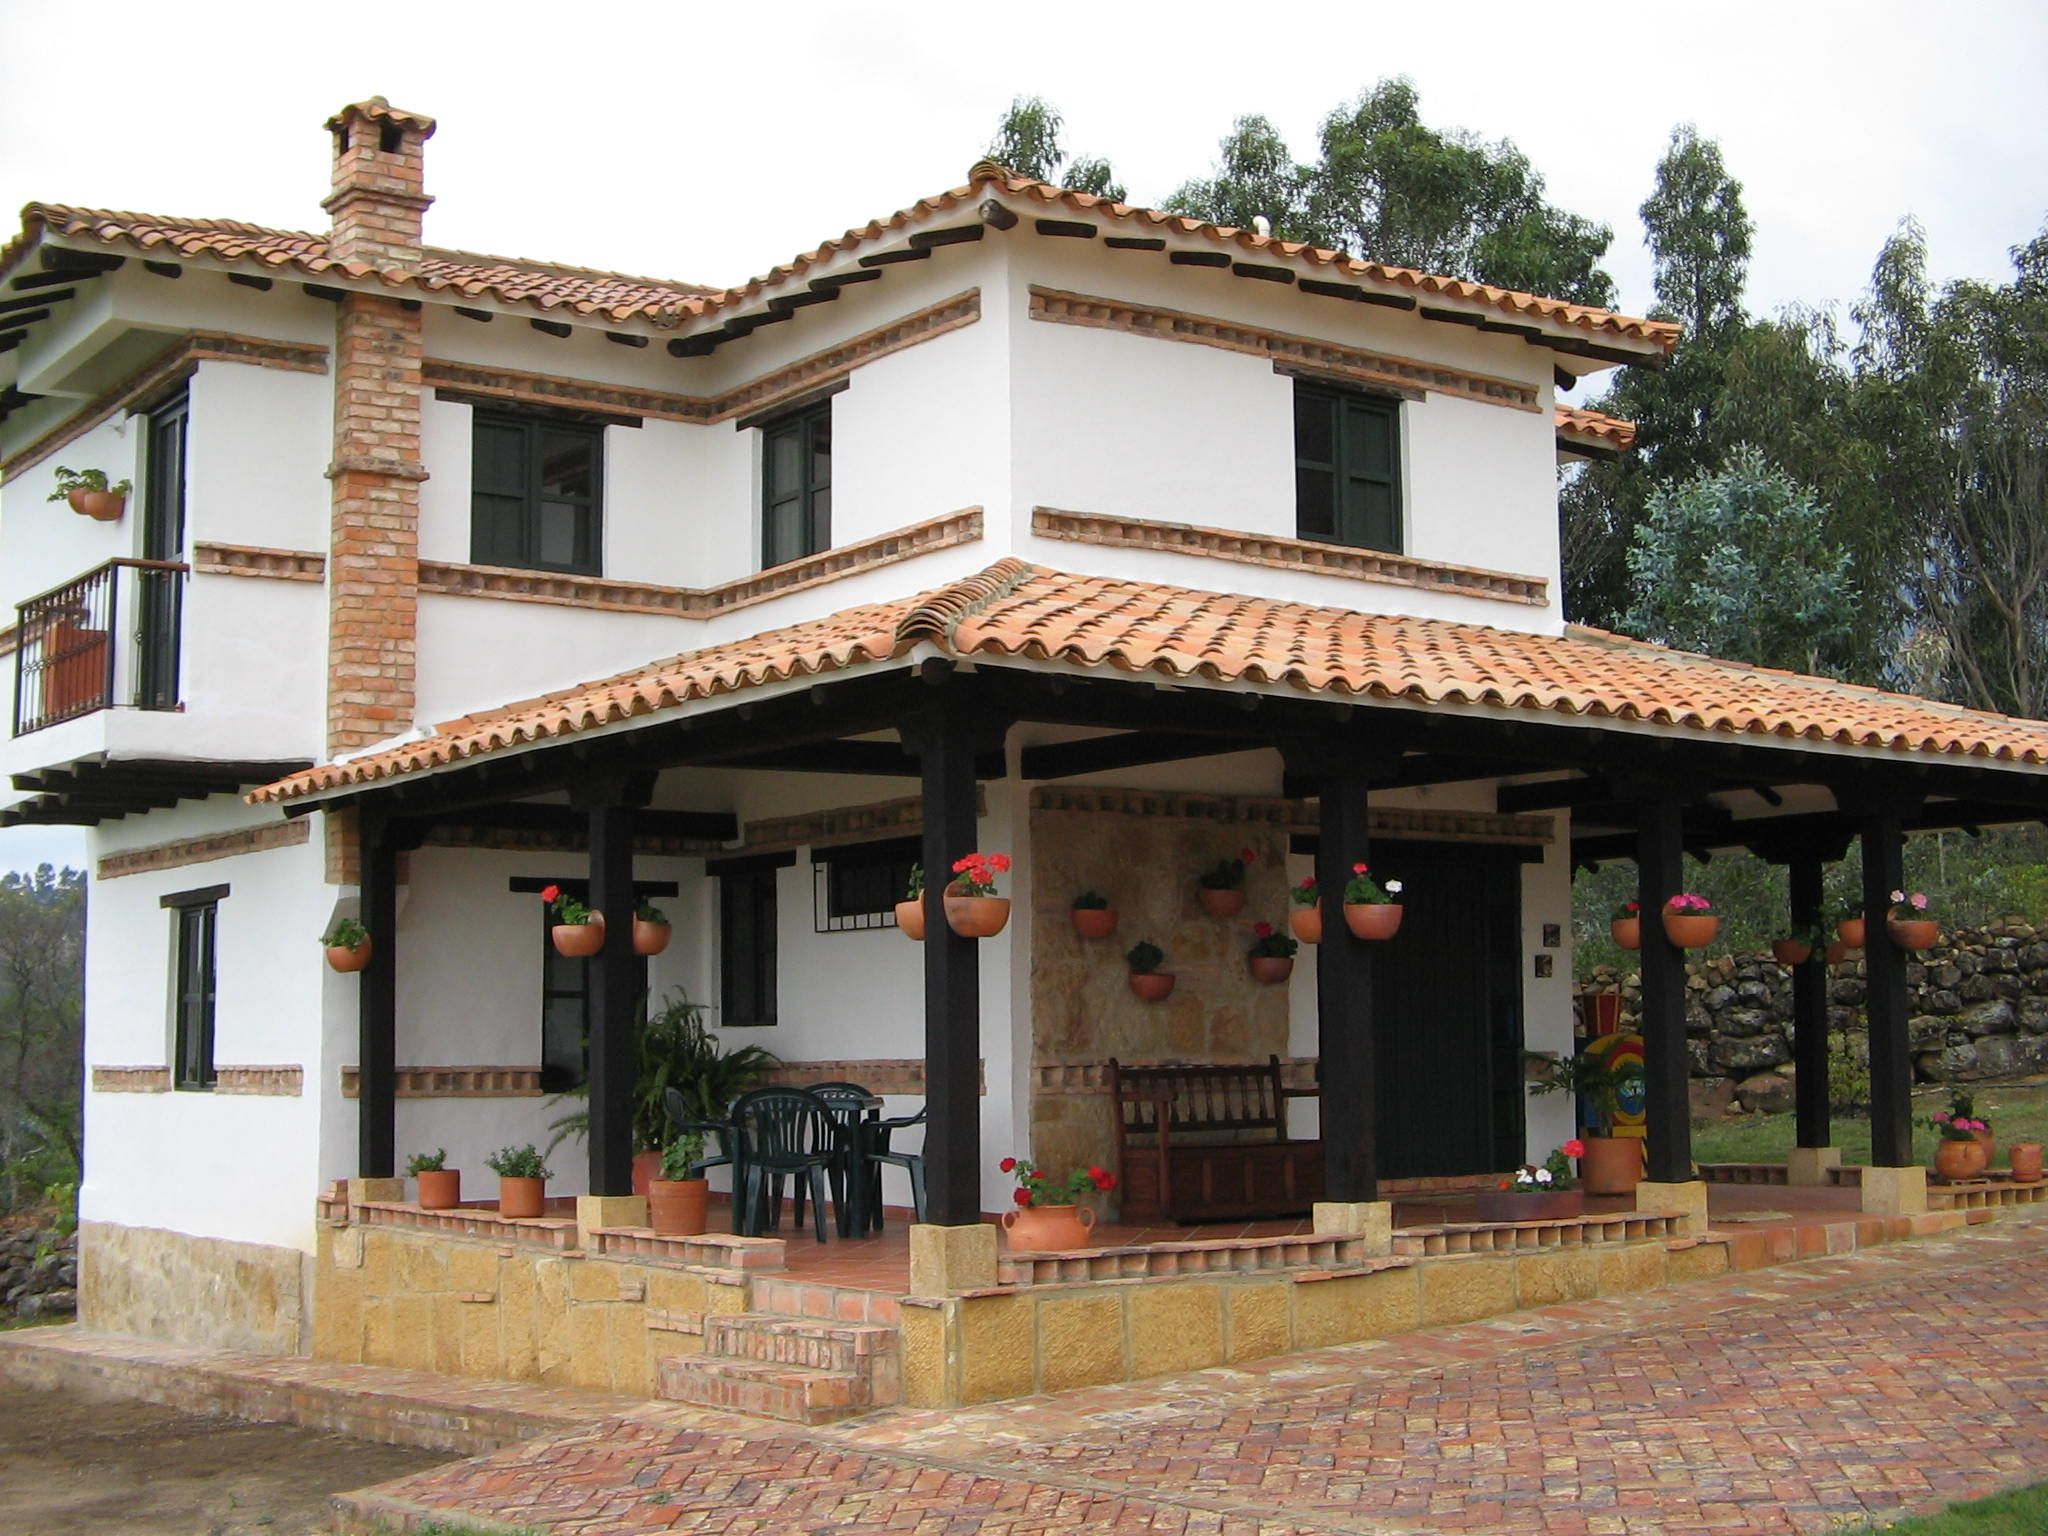 Modelos de casas llaneras buscar con google agro 2015 for Modelos de casas rusticas